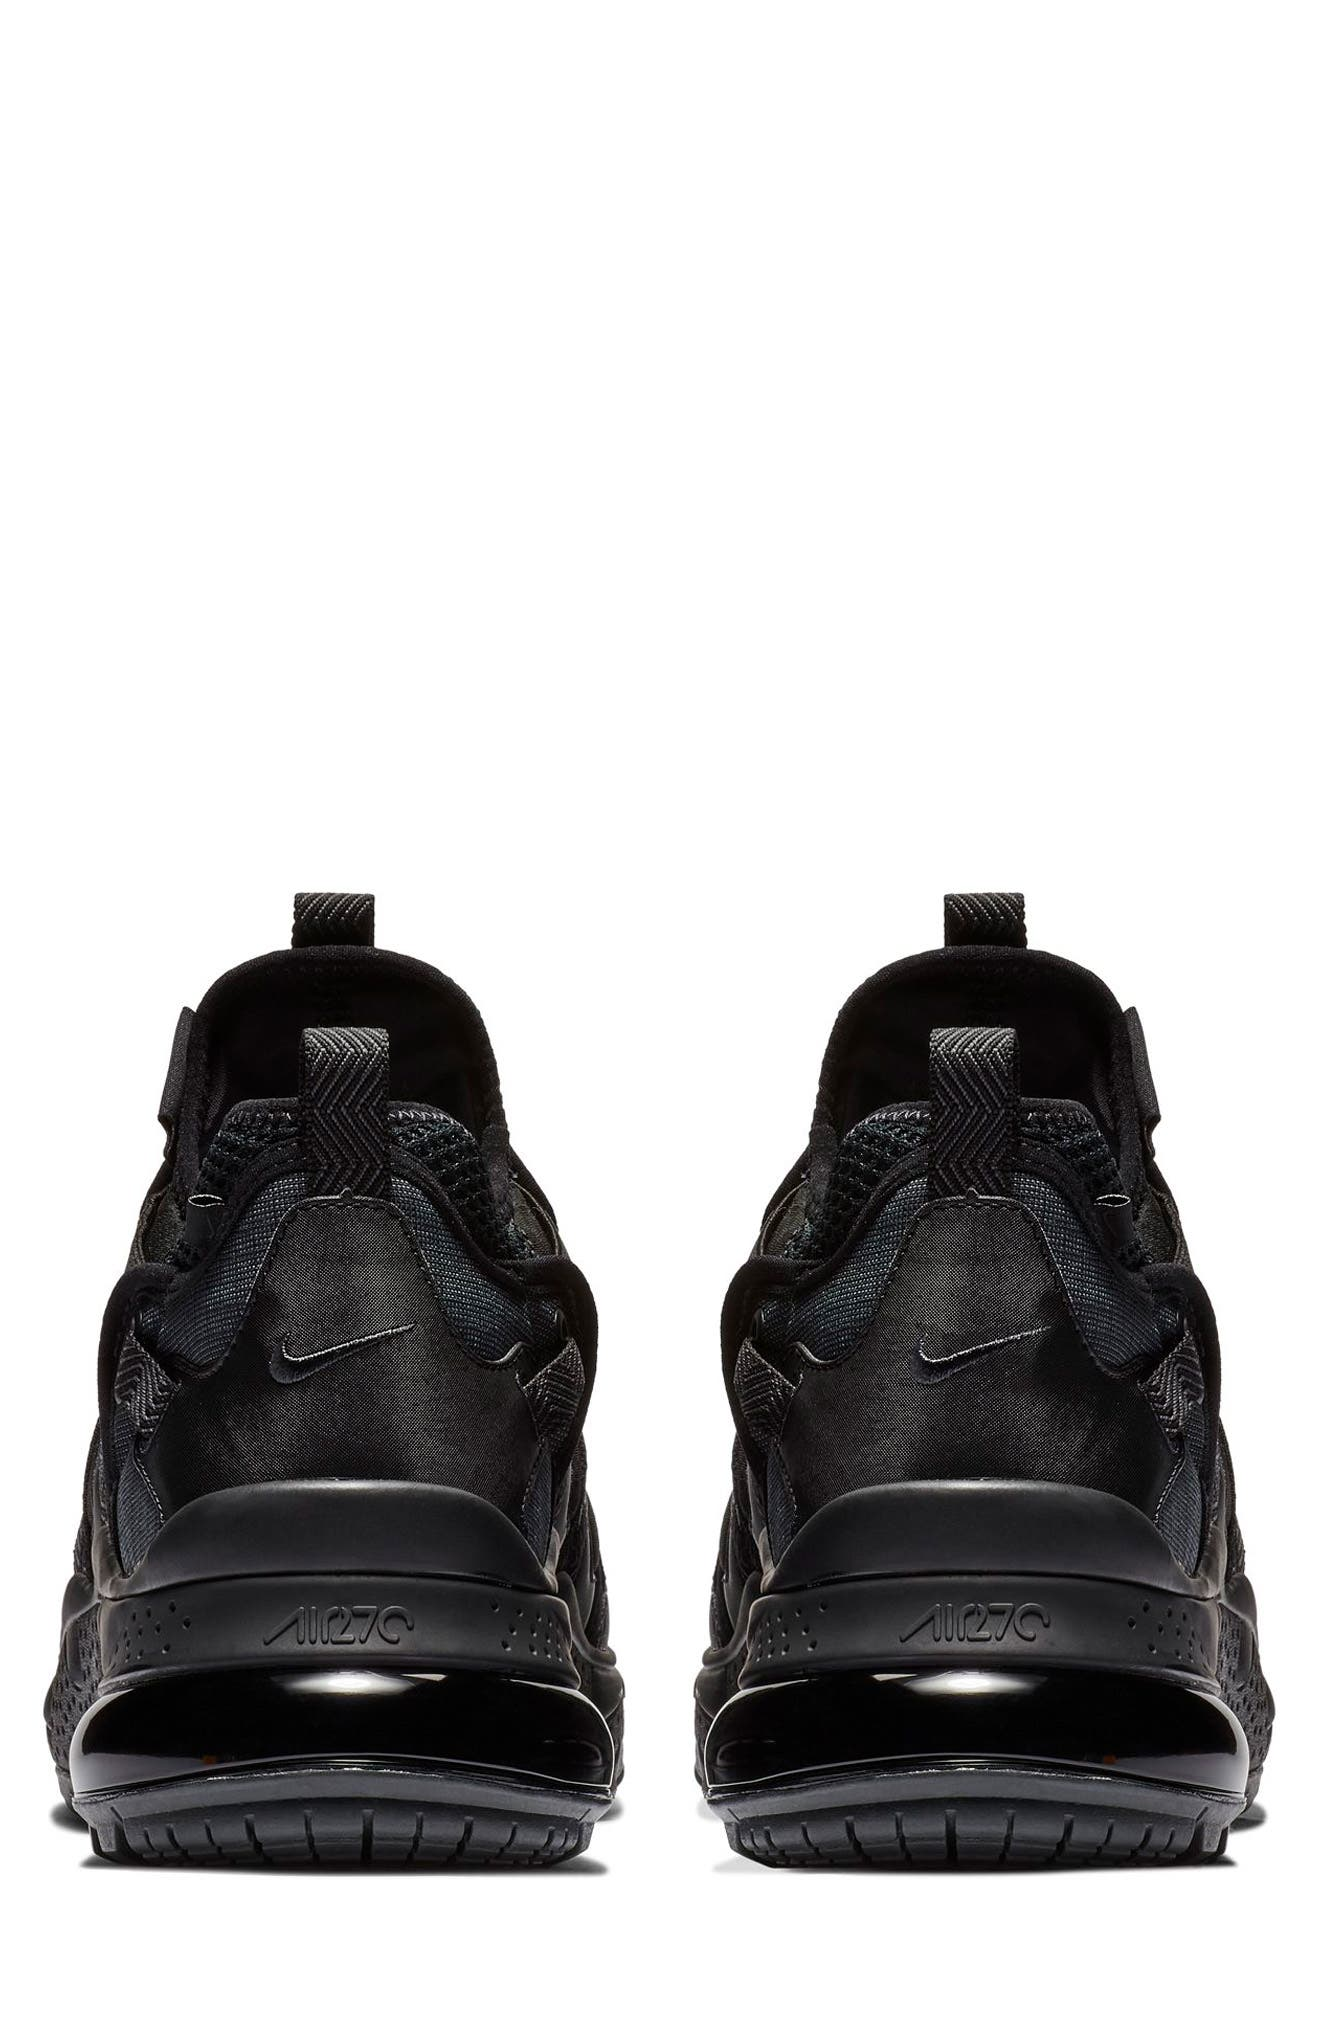 Air Max 270 Bowfin Sneaker,                             Alternate thumbnail 5, color,                             BLACK/ ANTHRACITE/ BLACK